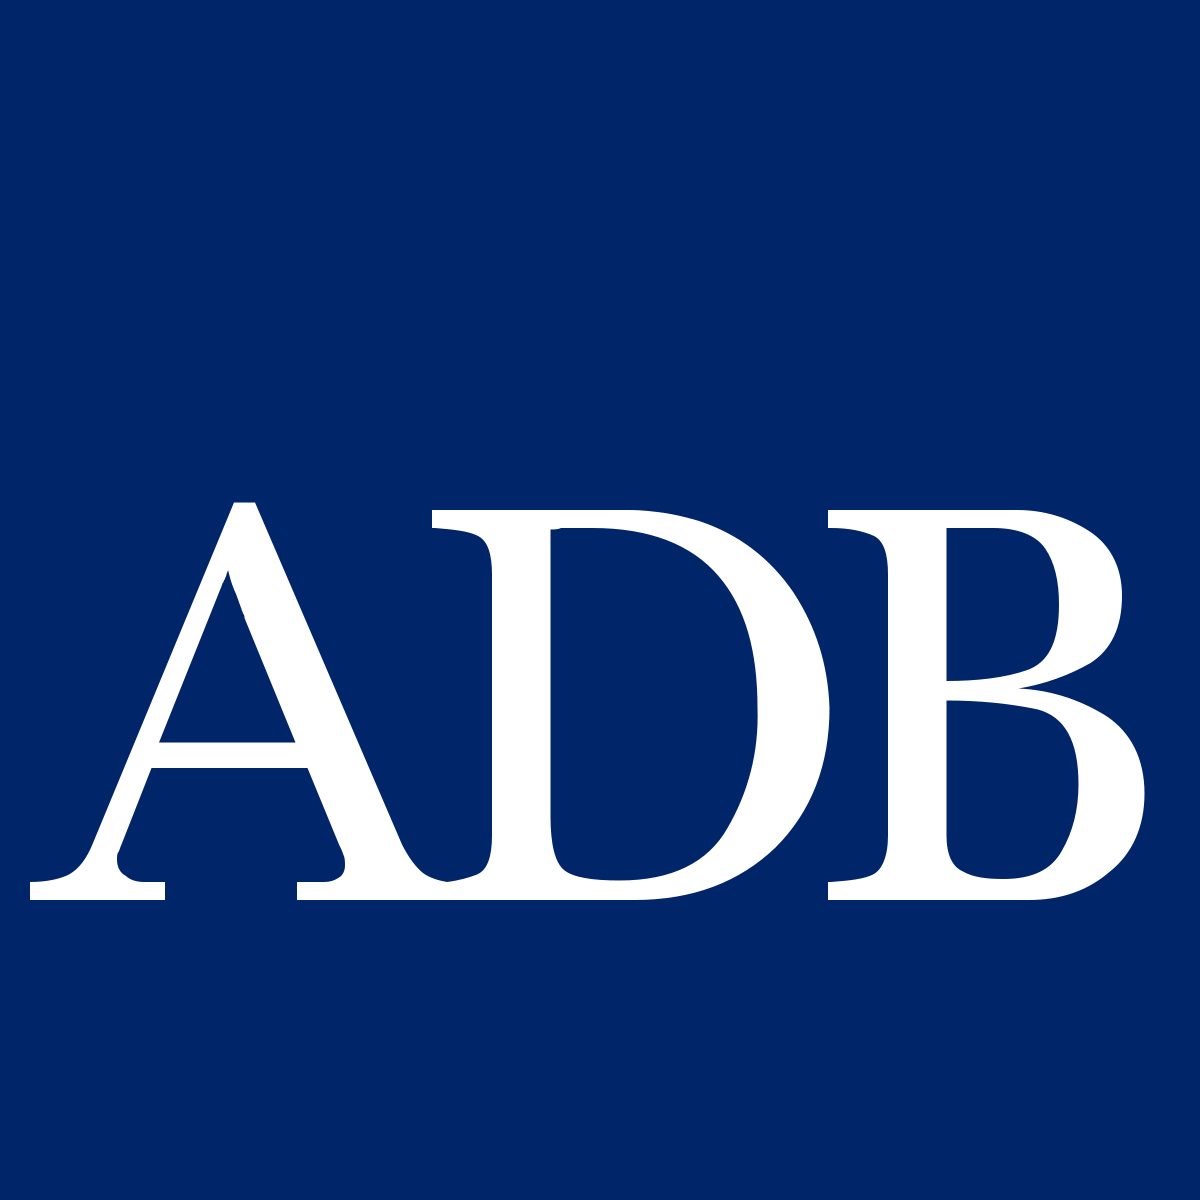 Asian Development Bank image